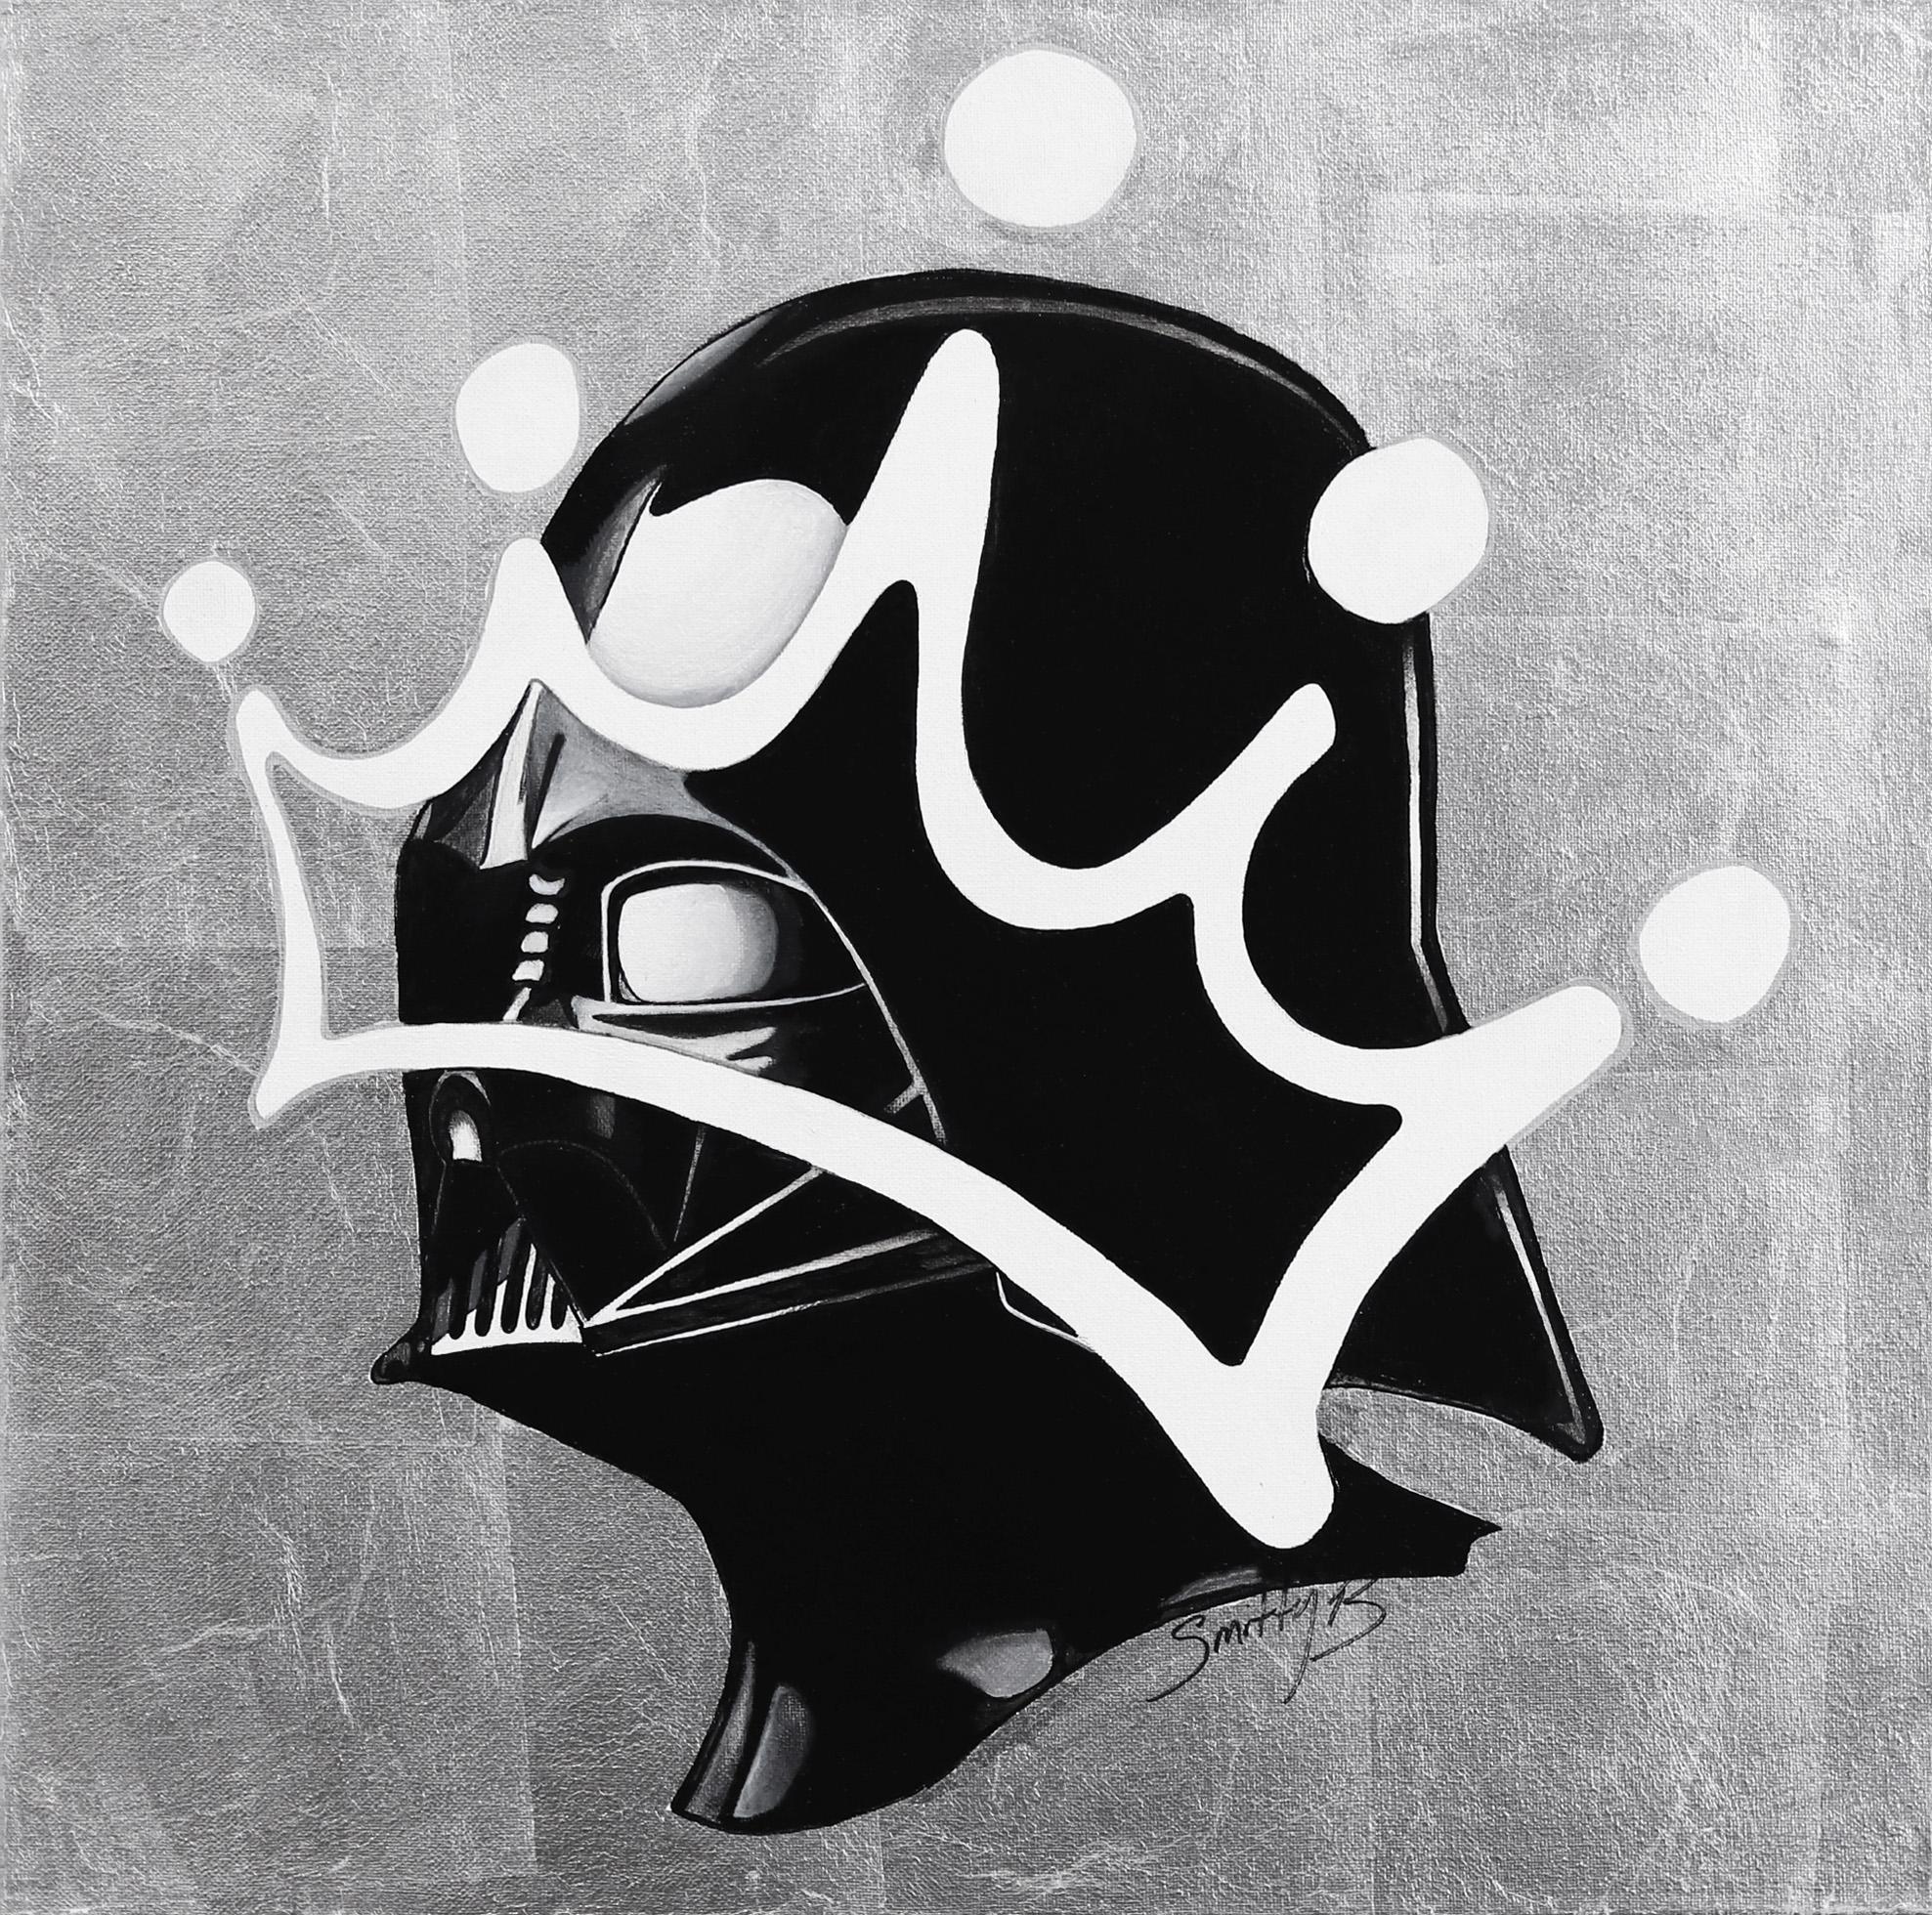 Liege - Star Wars Darth Vader Silver Leaf Original Painting